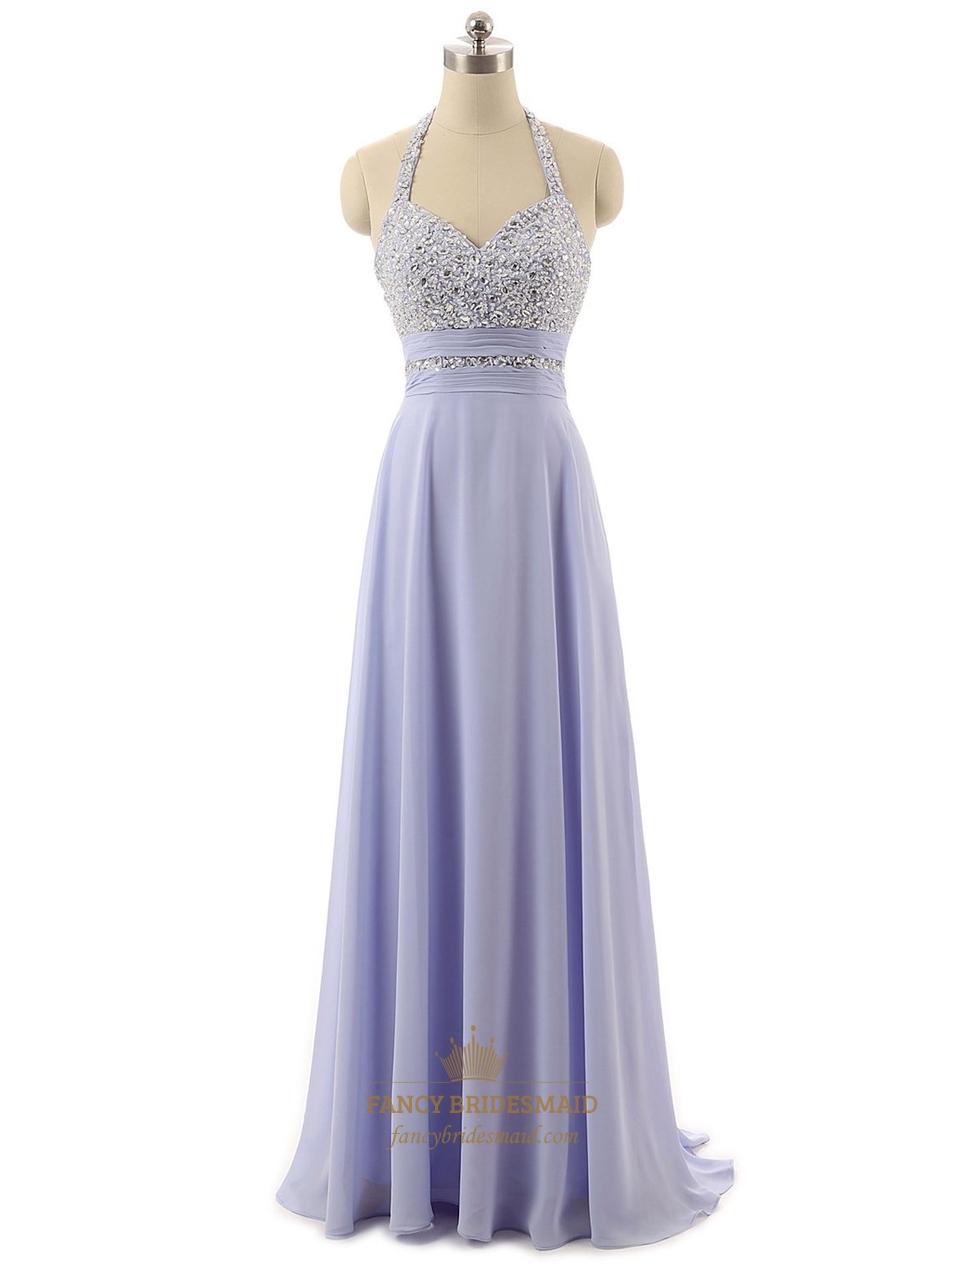 Lavender Beaded Bodice Halter Neck Chiffon Formal Dress